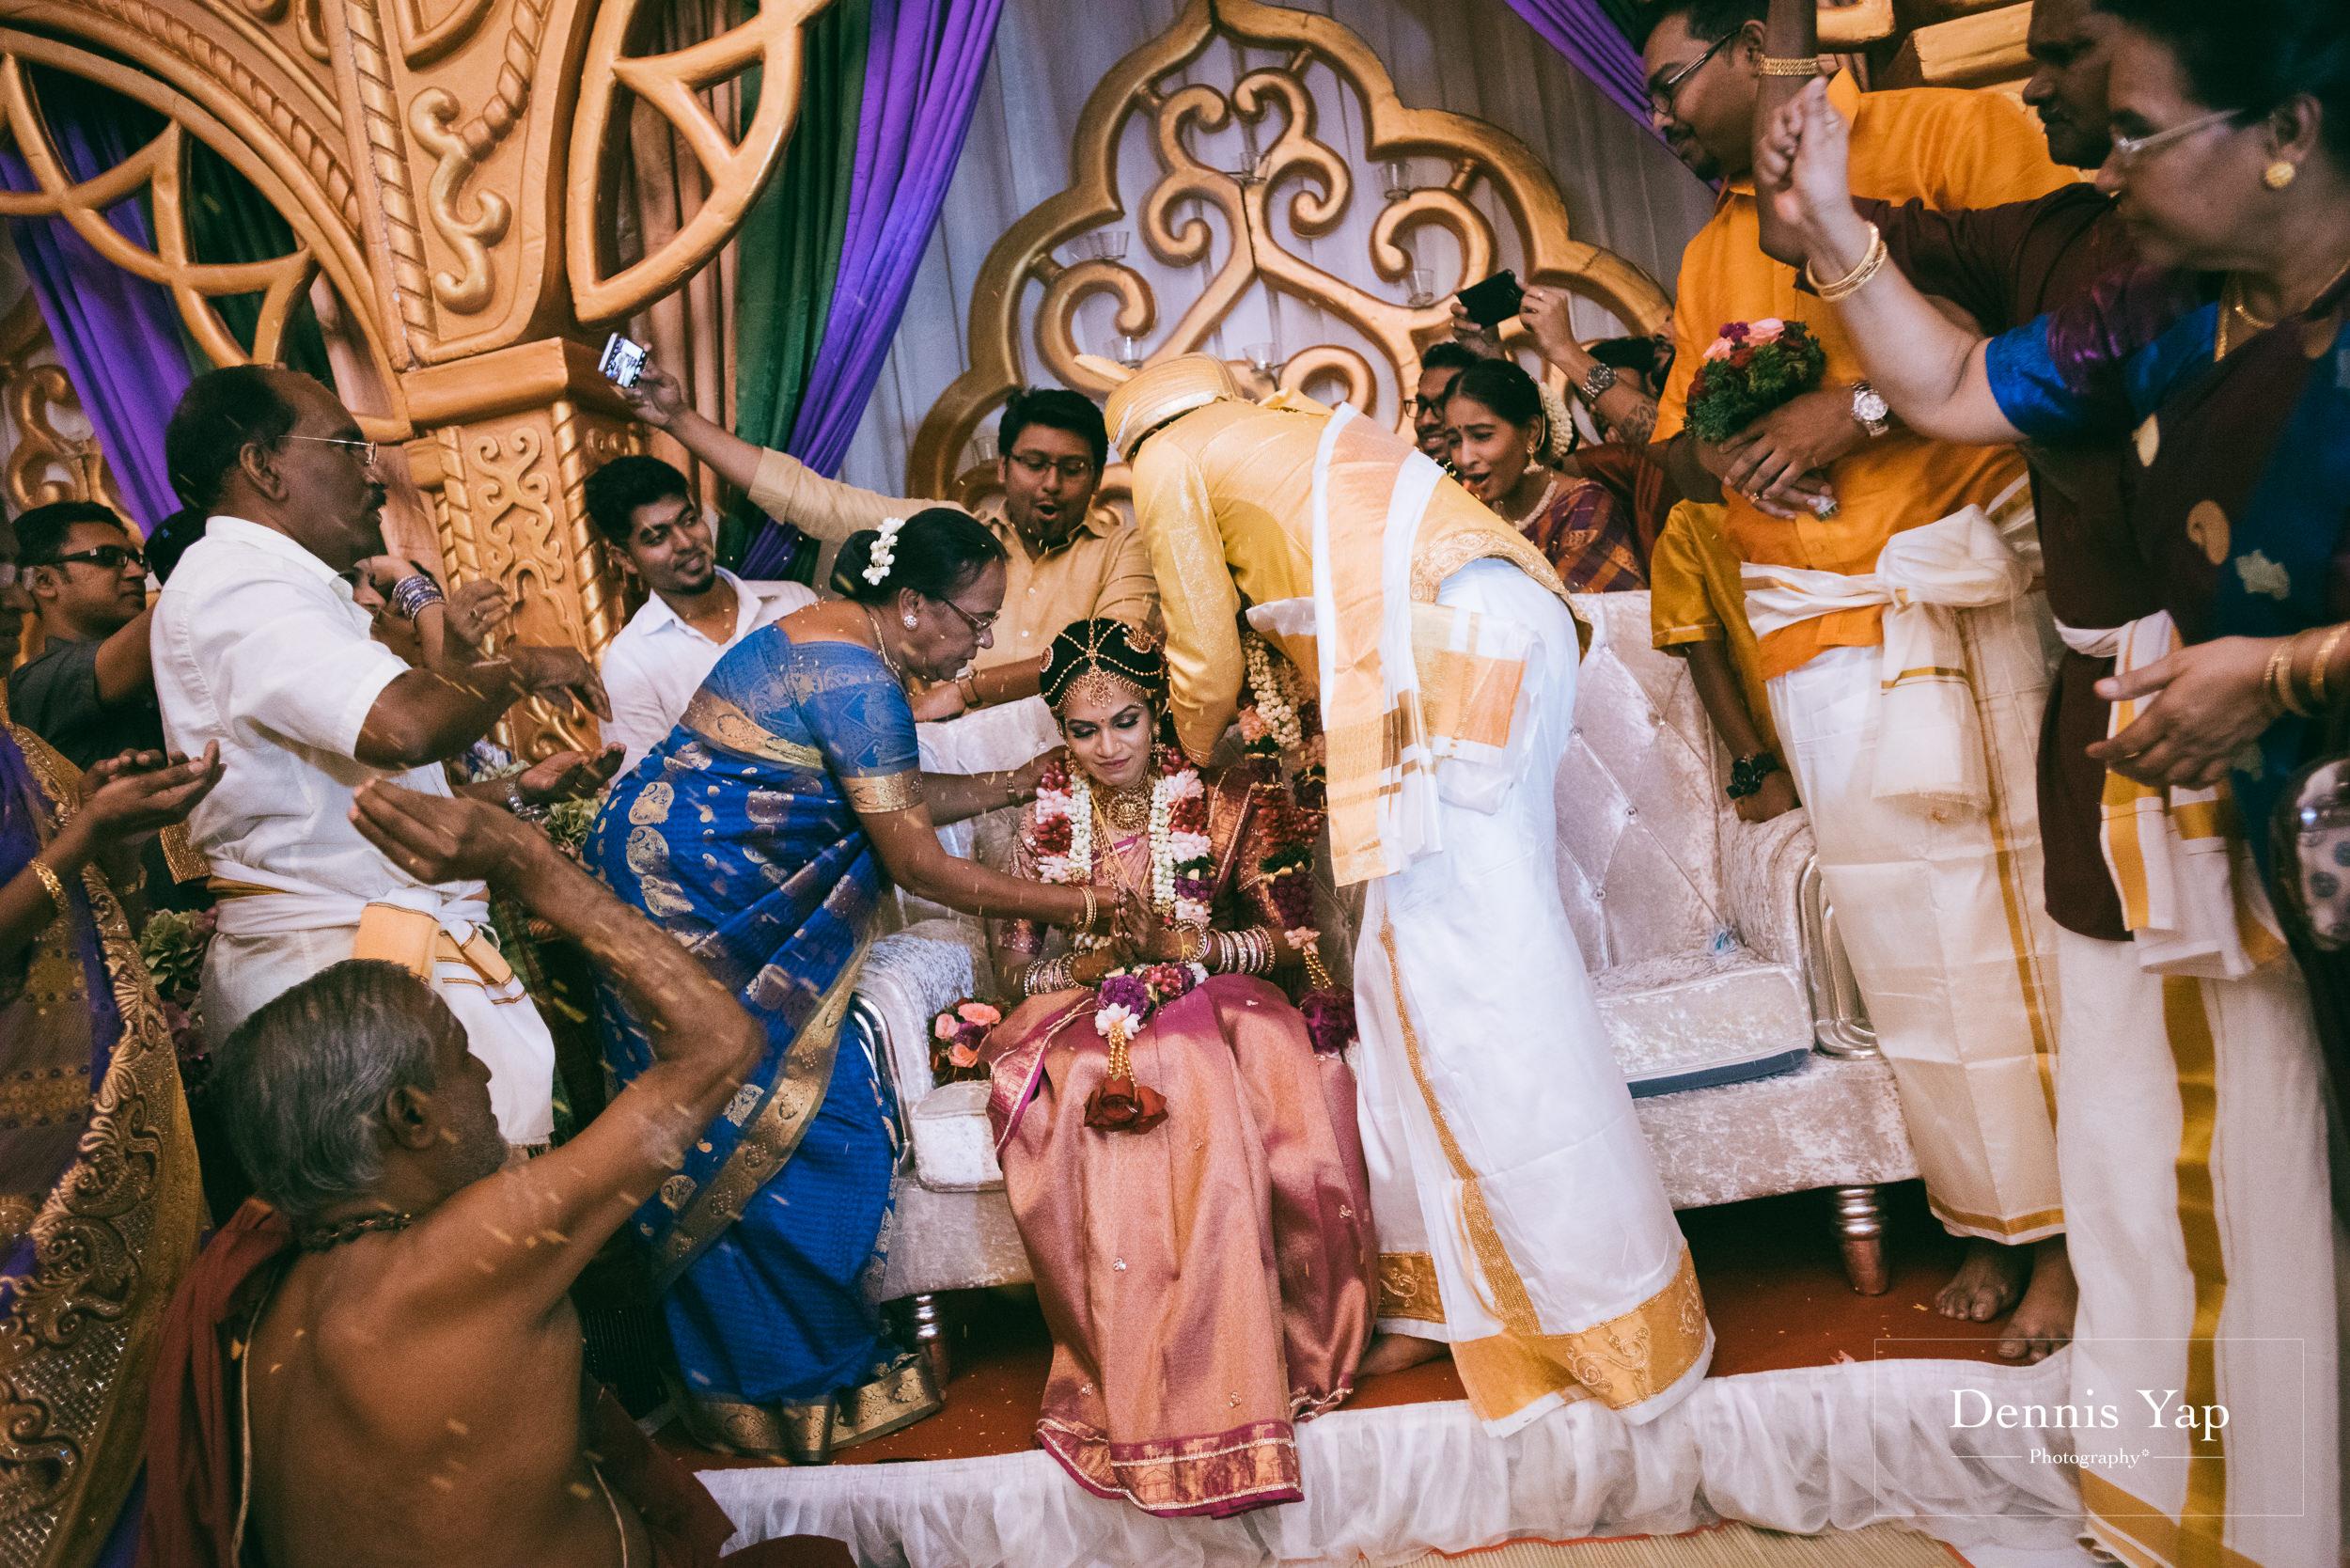 puvaneswaran cangitaa indian wedding ceremony ideal convention dennis yap photography malaysia-23.jpg